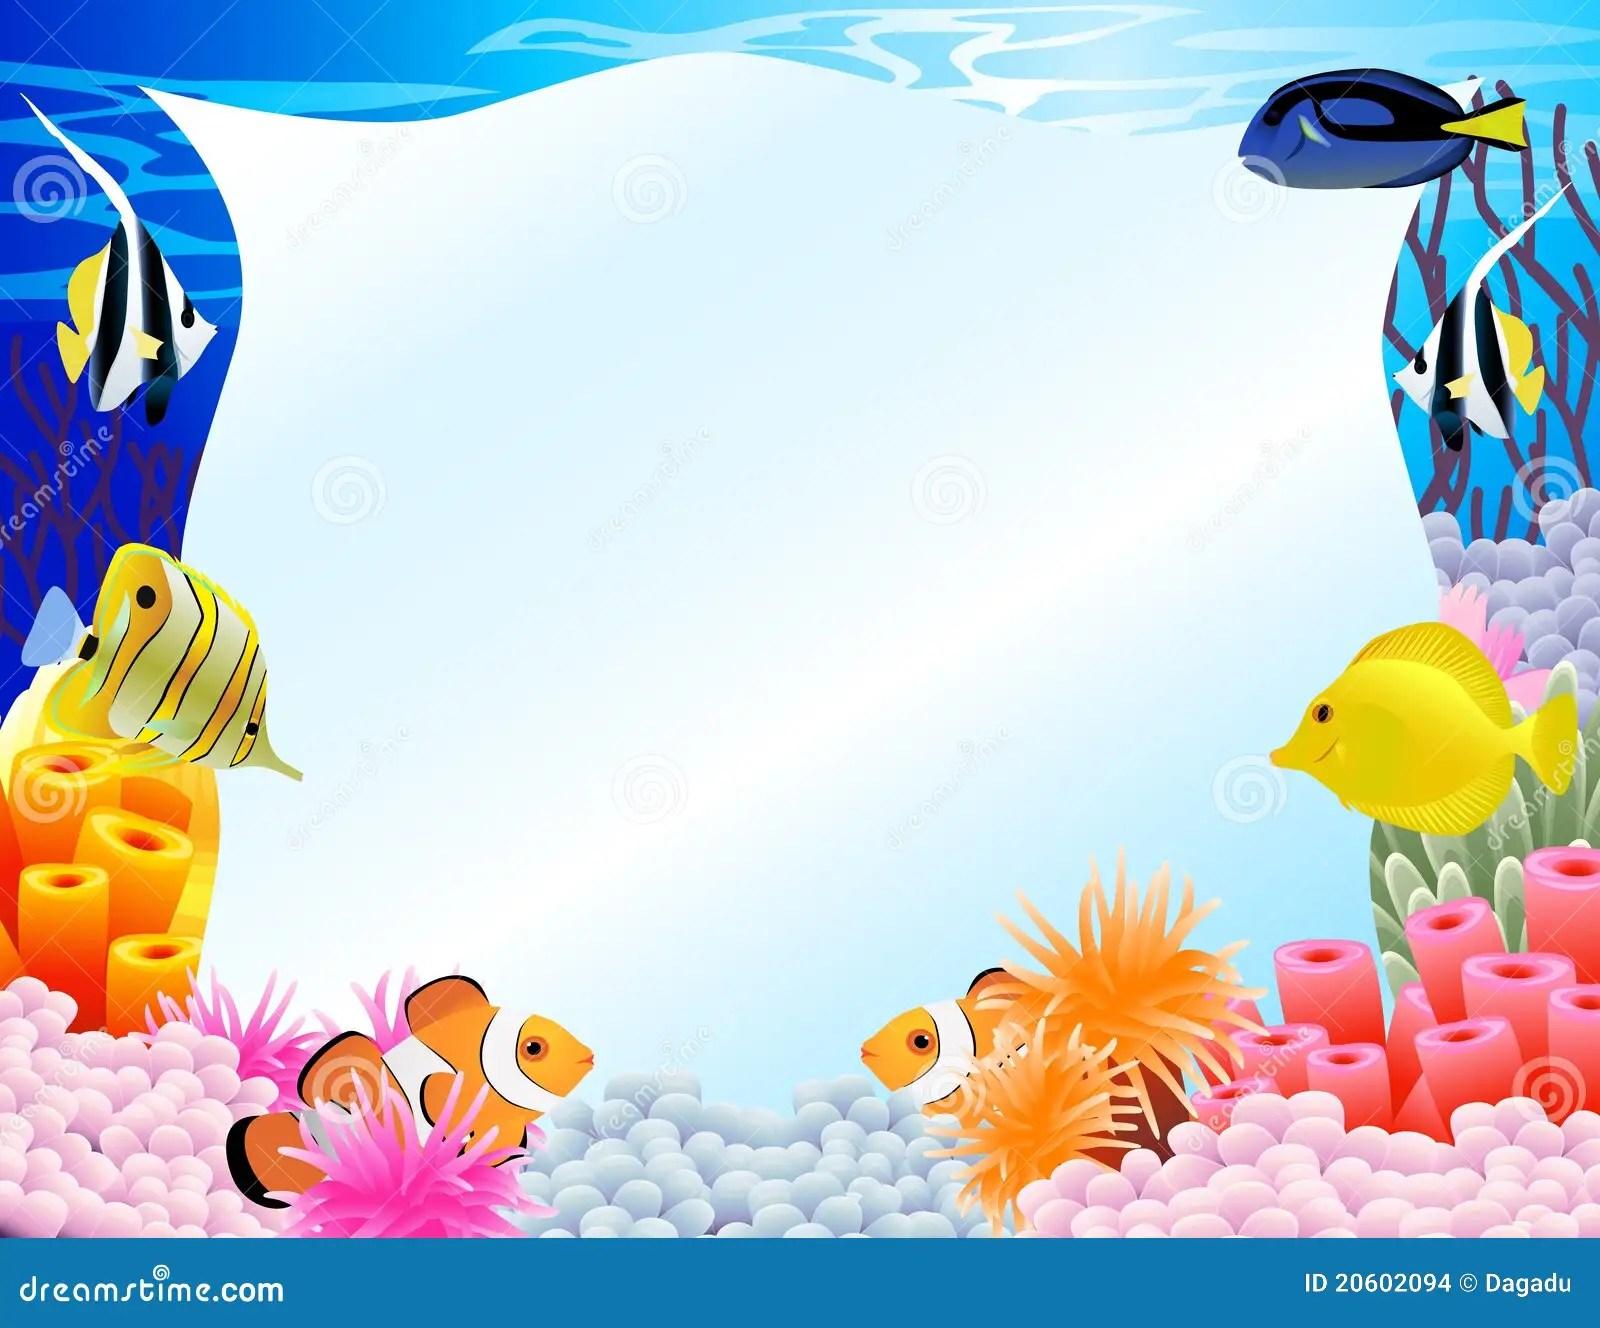 Cute Algae Wallpaper Sea Life Background Stock Vector Illustration Of Happy